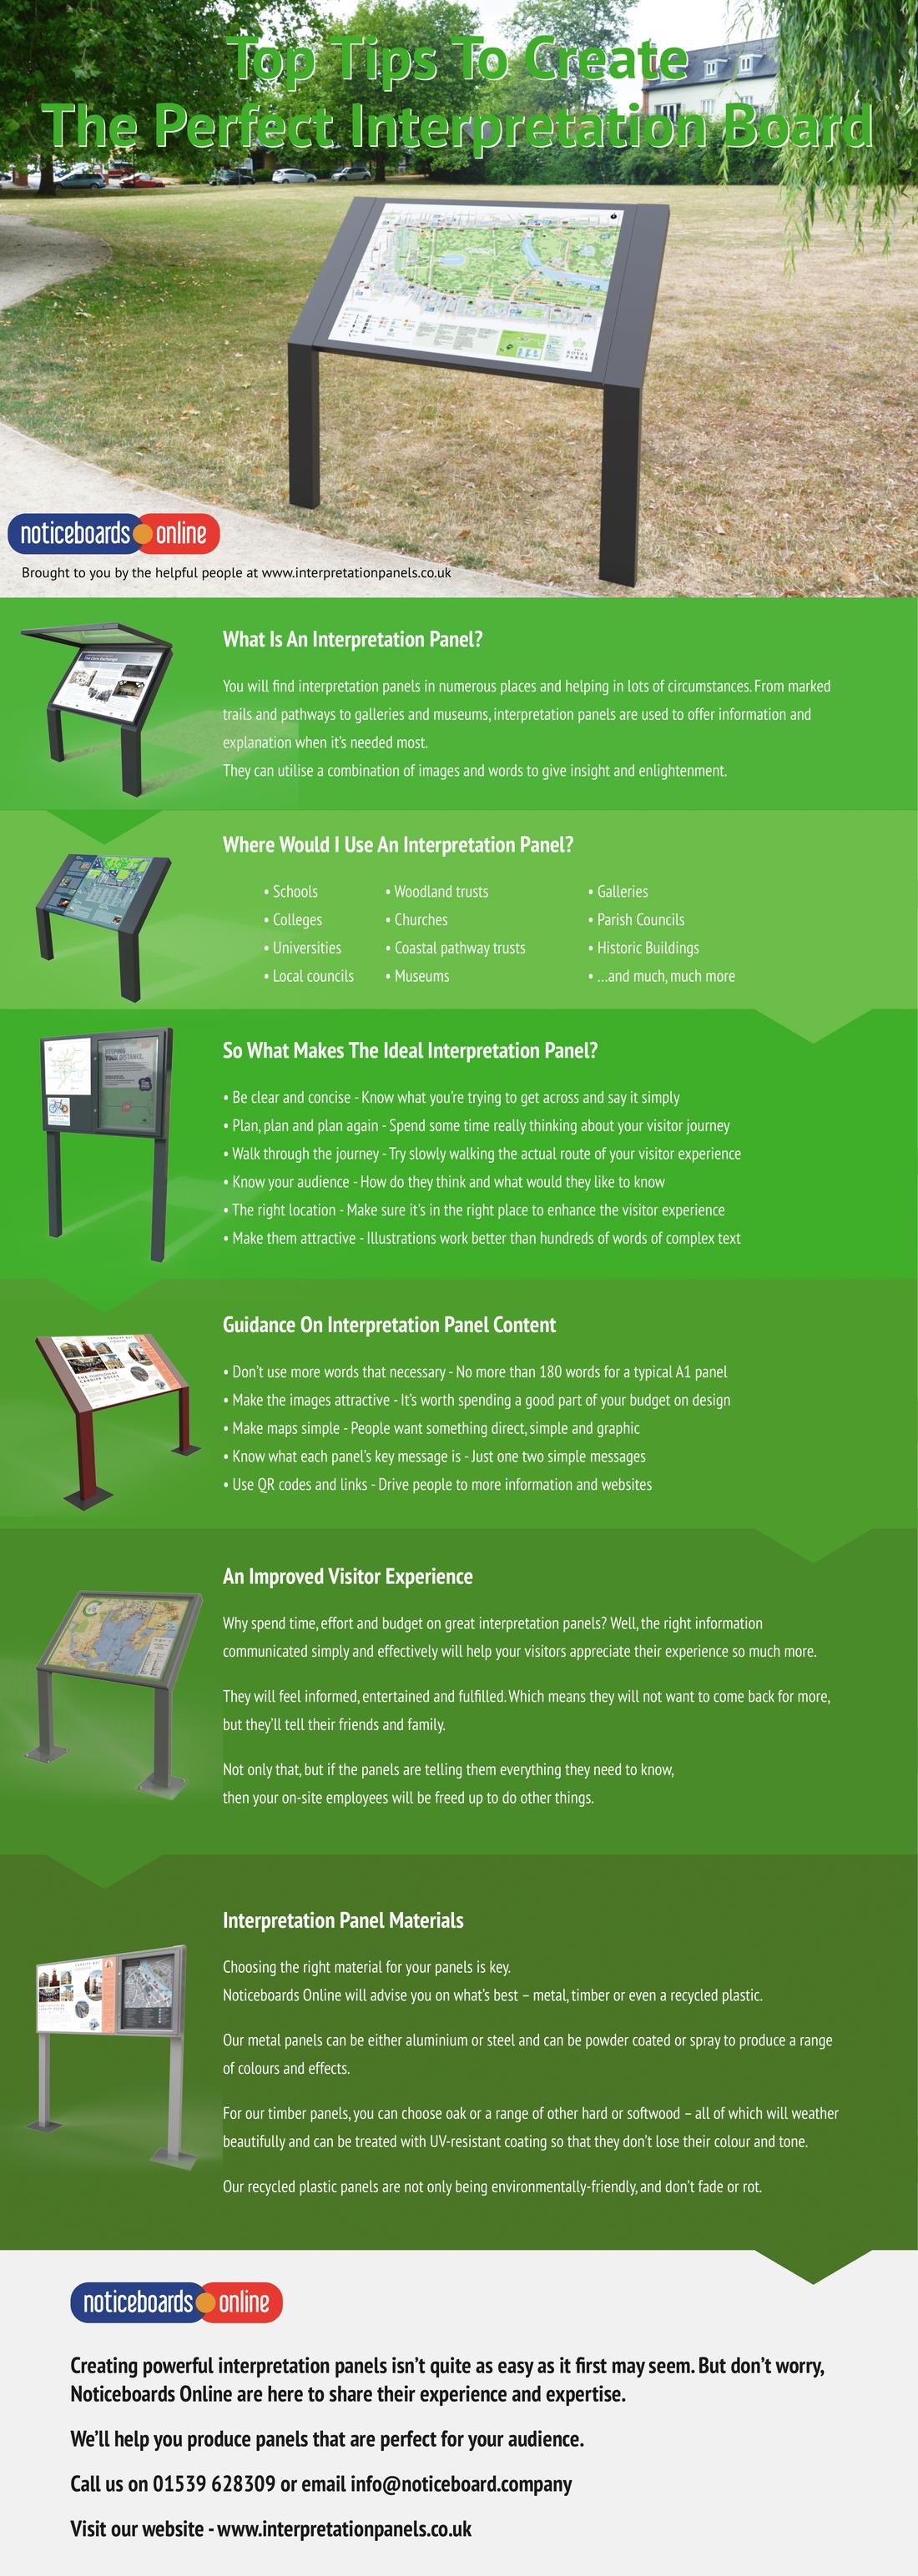 Top Tips to Create The Perfect Interpretation Board